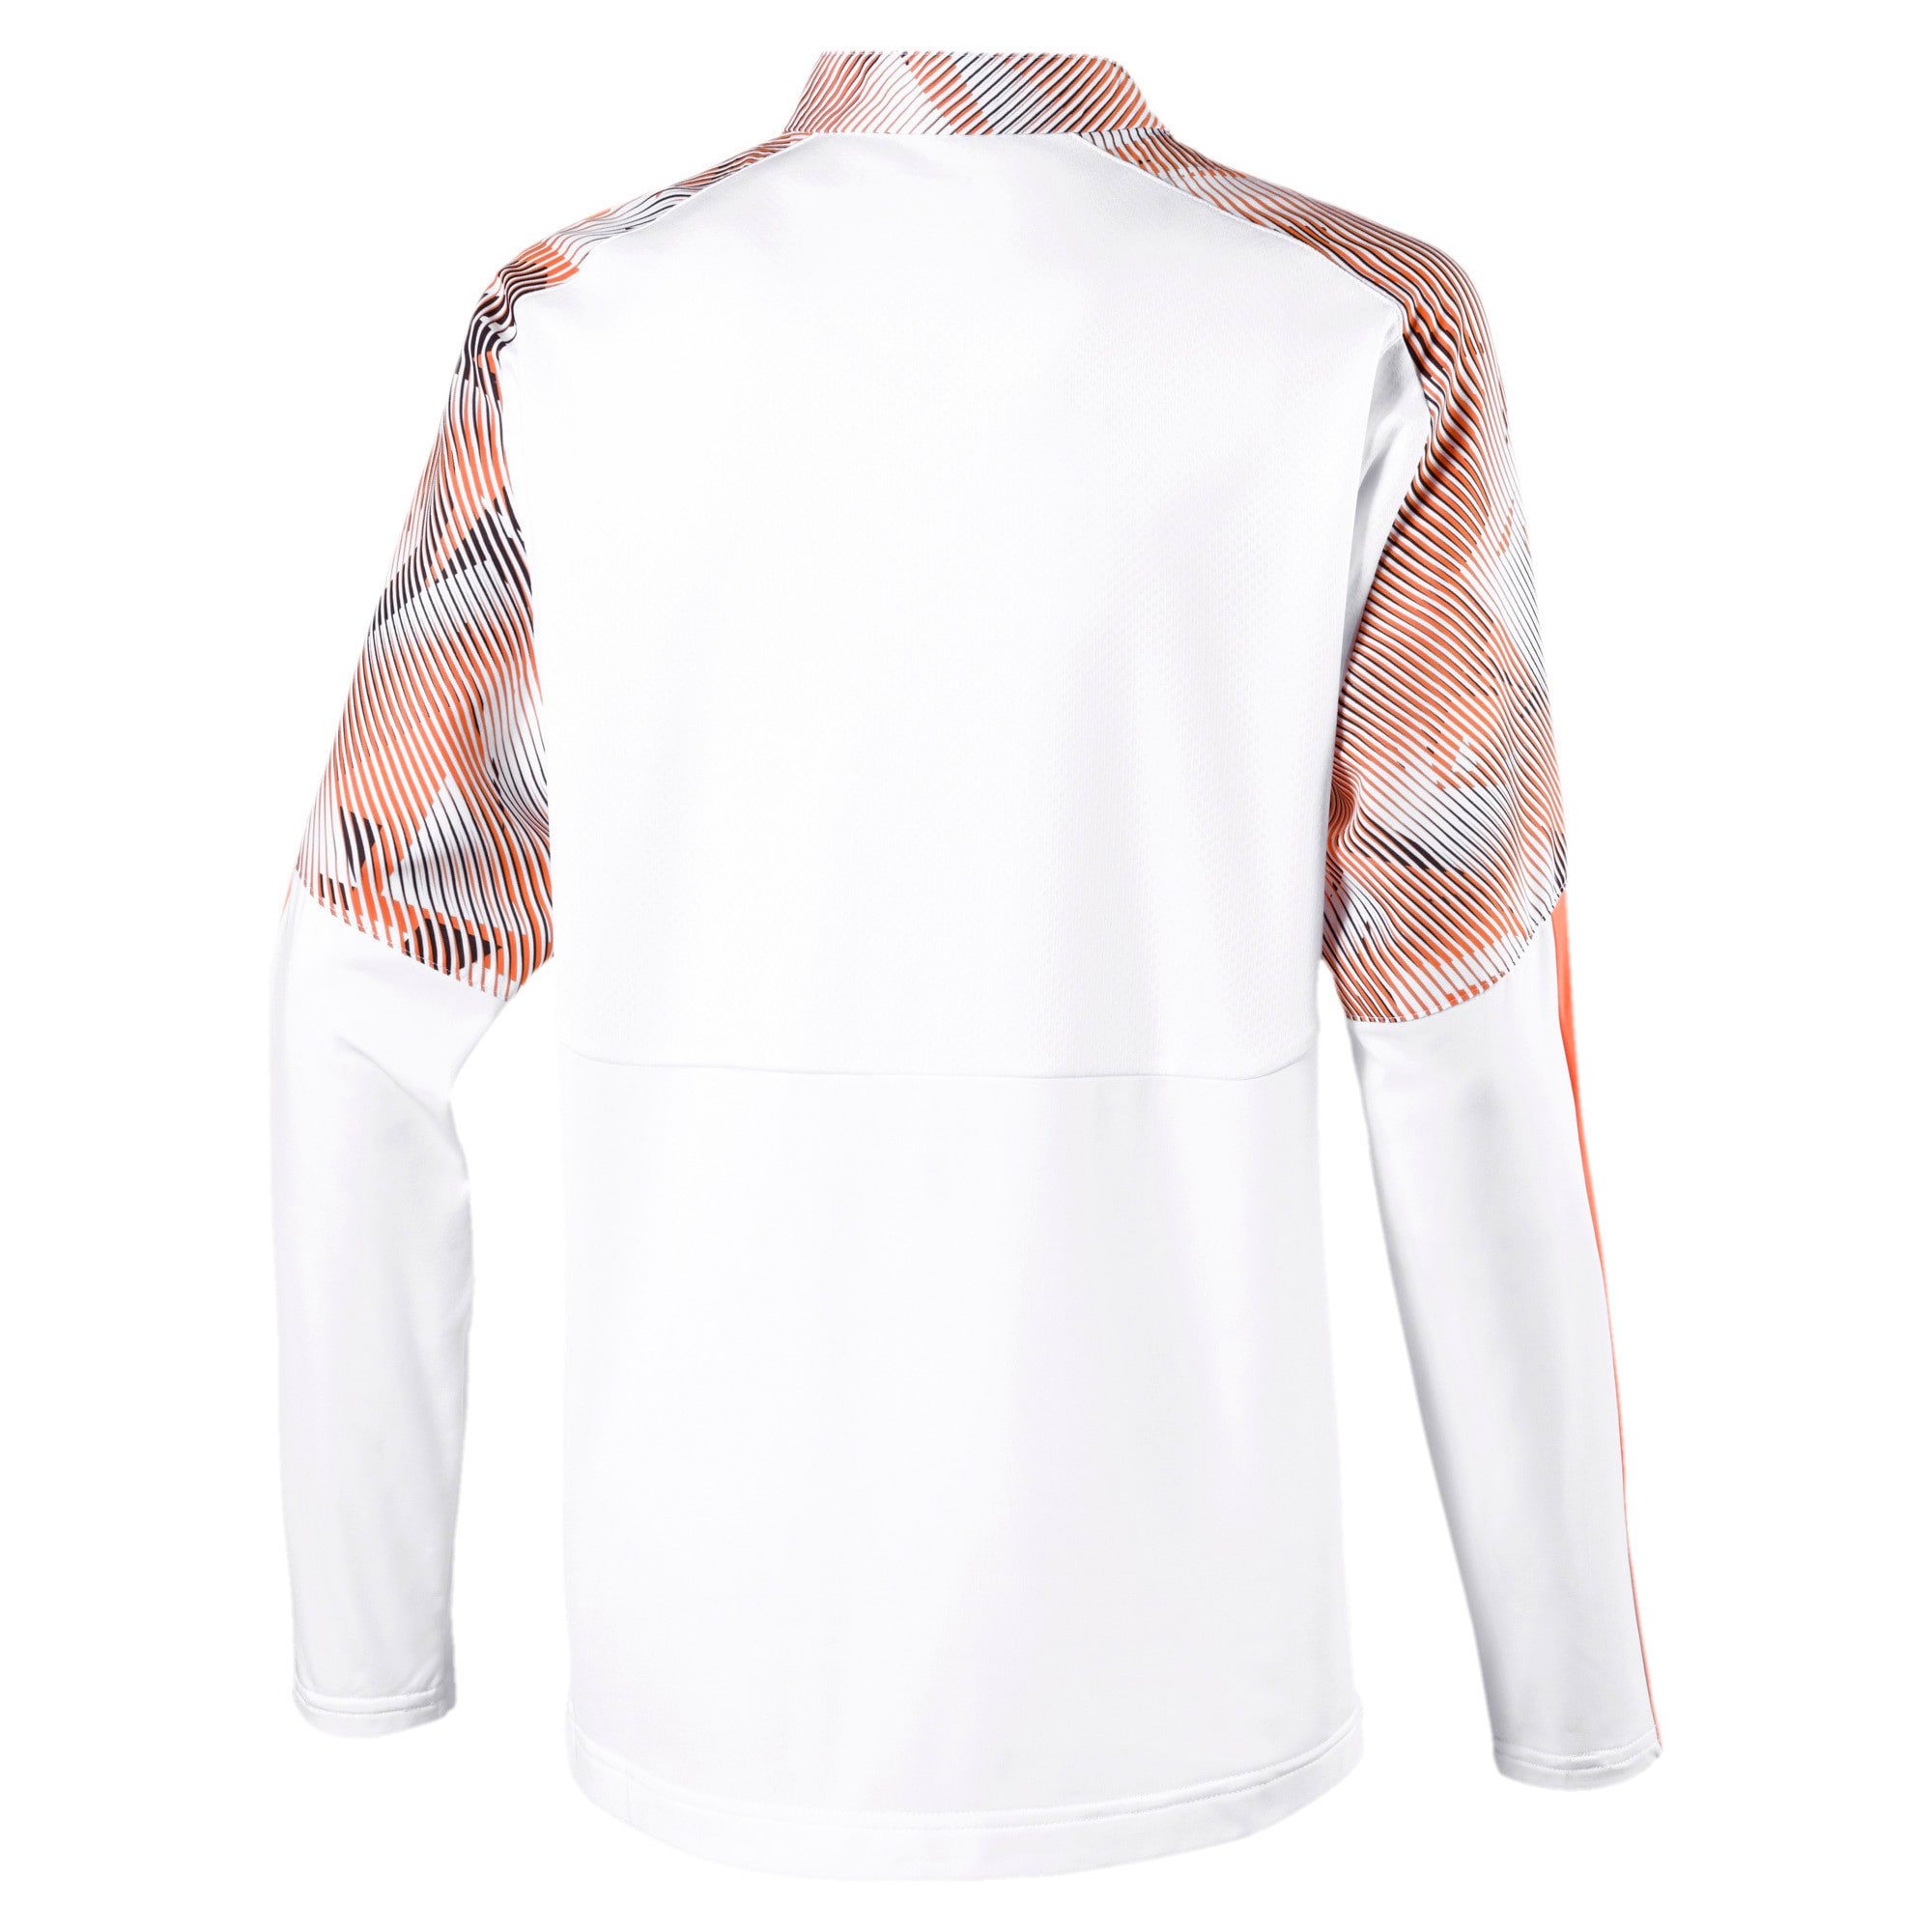 Imagen en miniatura 2 de Camiseta de training con media cremallera de niño Valencia CF, Puma White-Fizzy Orange, mediana